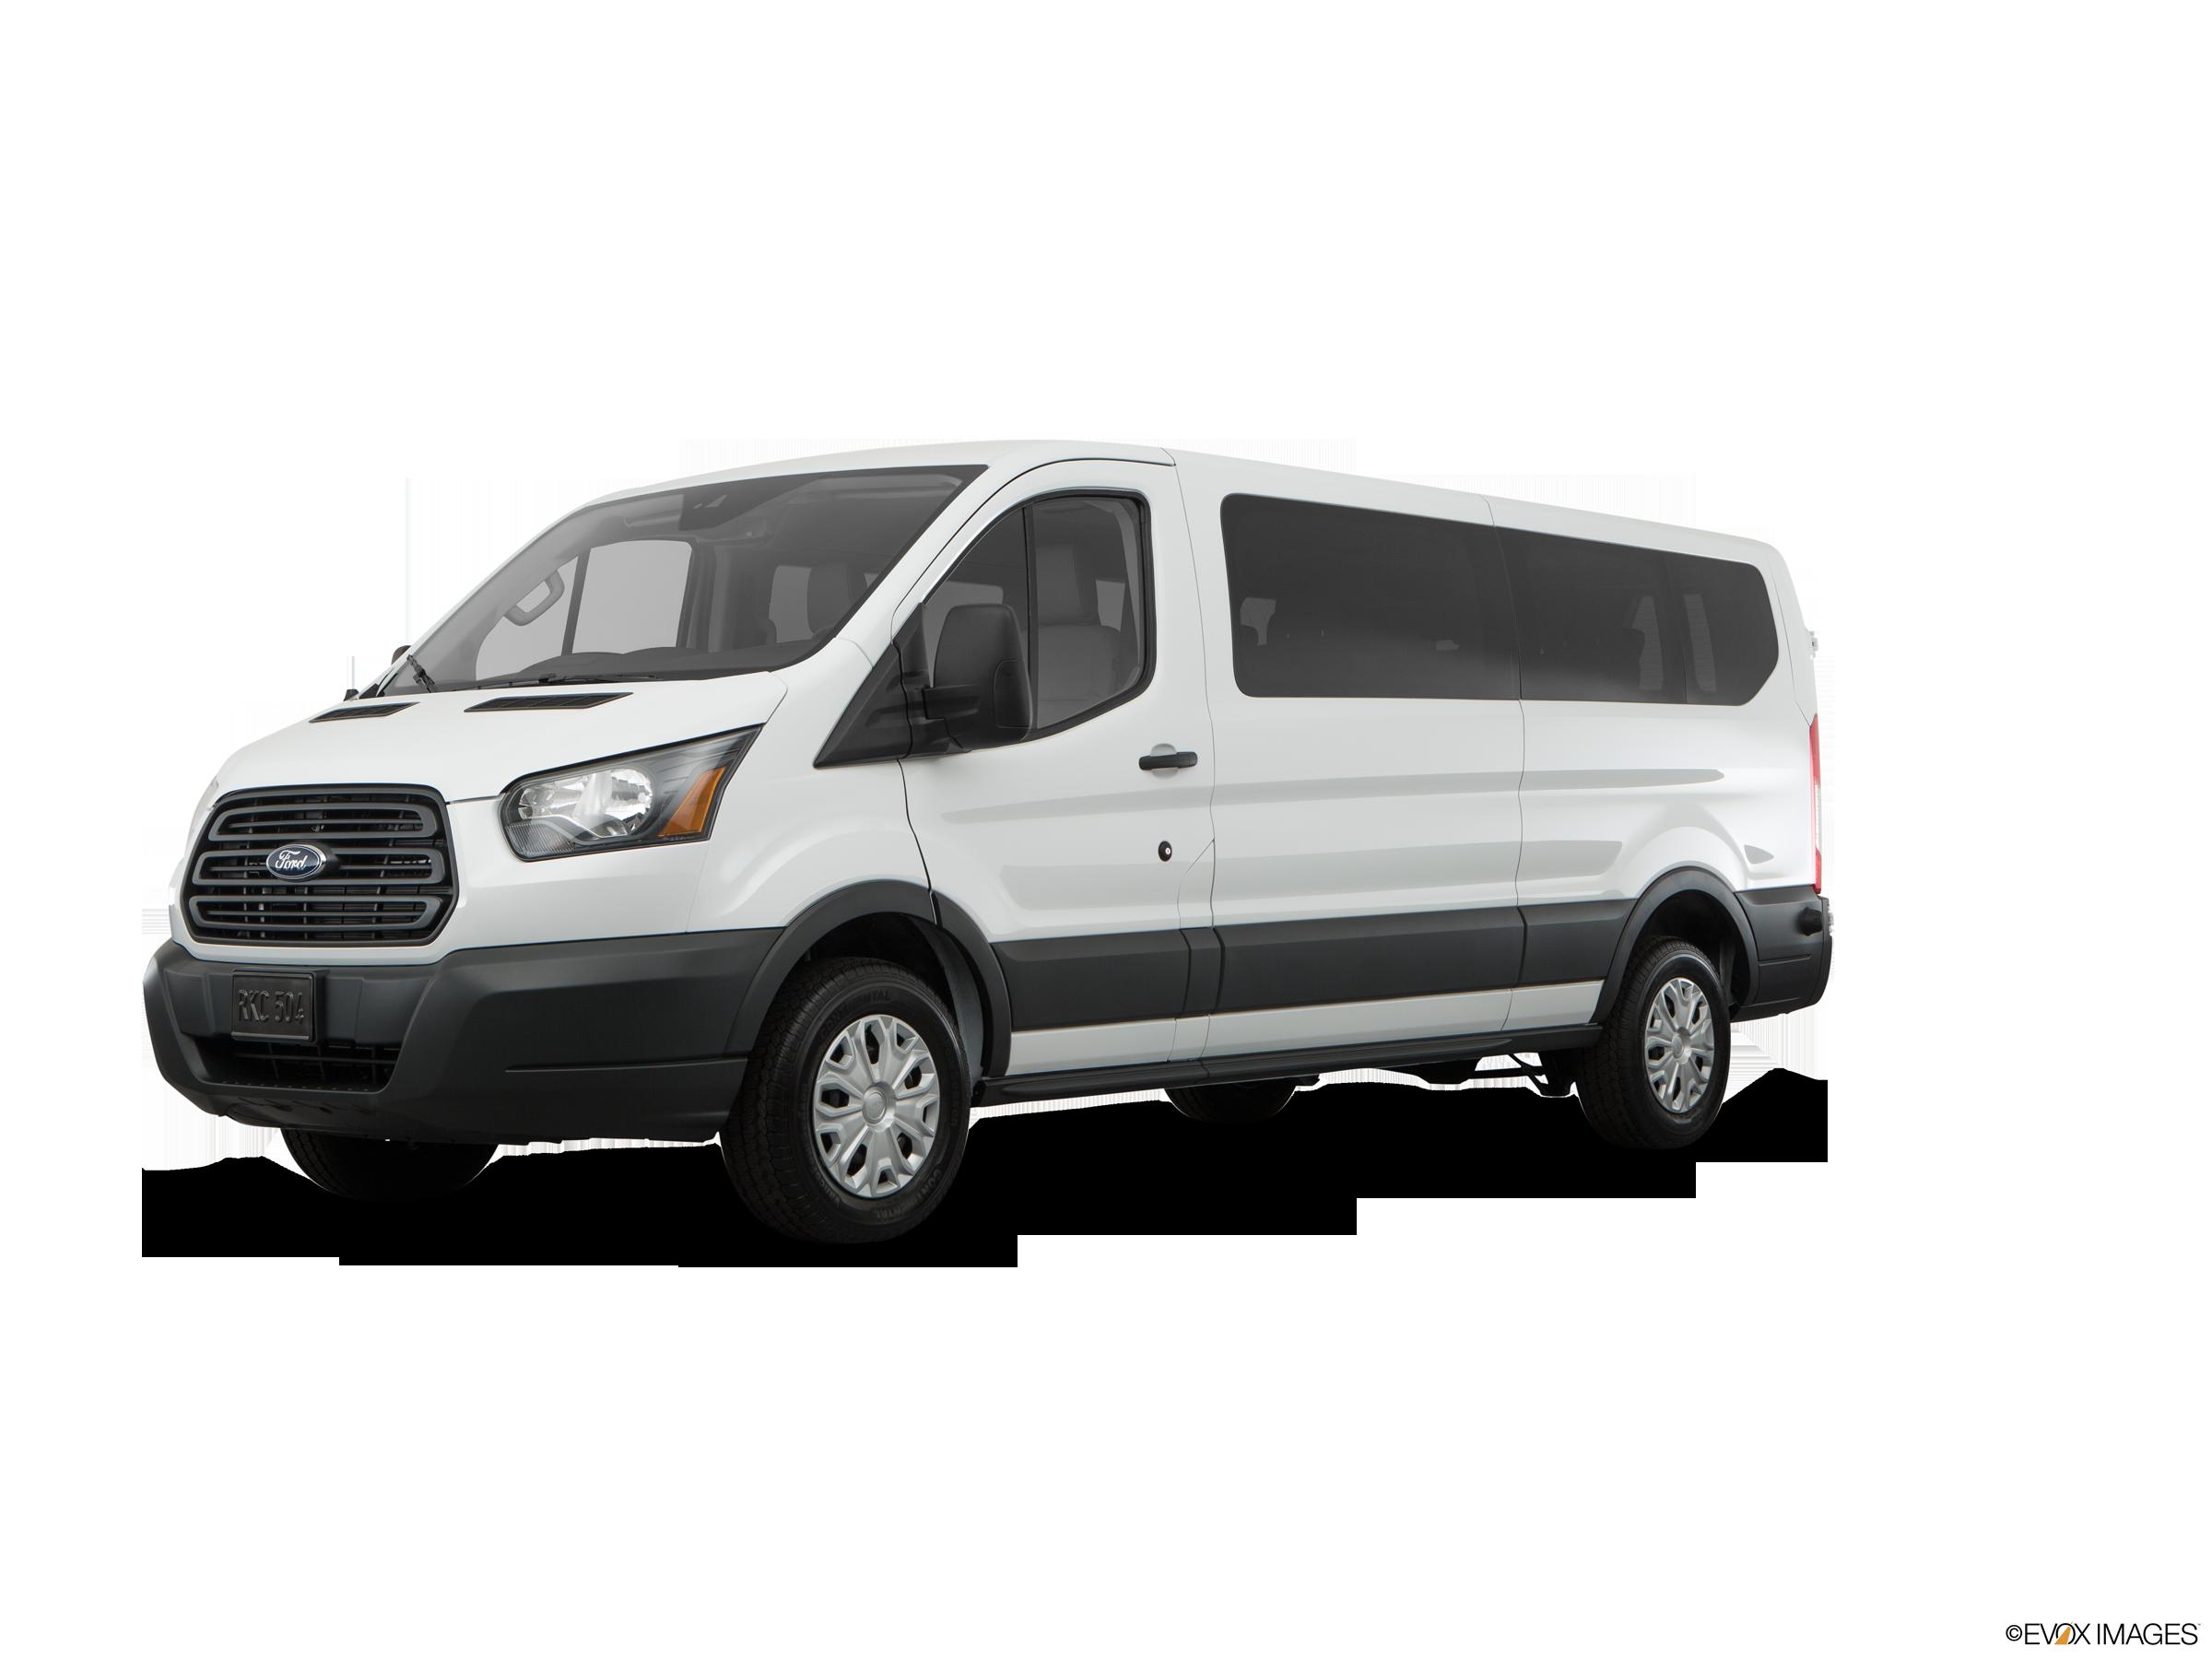 2017 Ford Transit 150 Cargo Van >> 2017 Ford Transit 150 Wagon Pricing Reviews Ratings